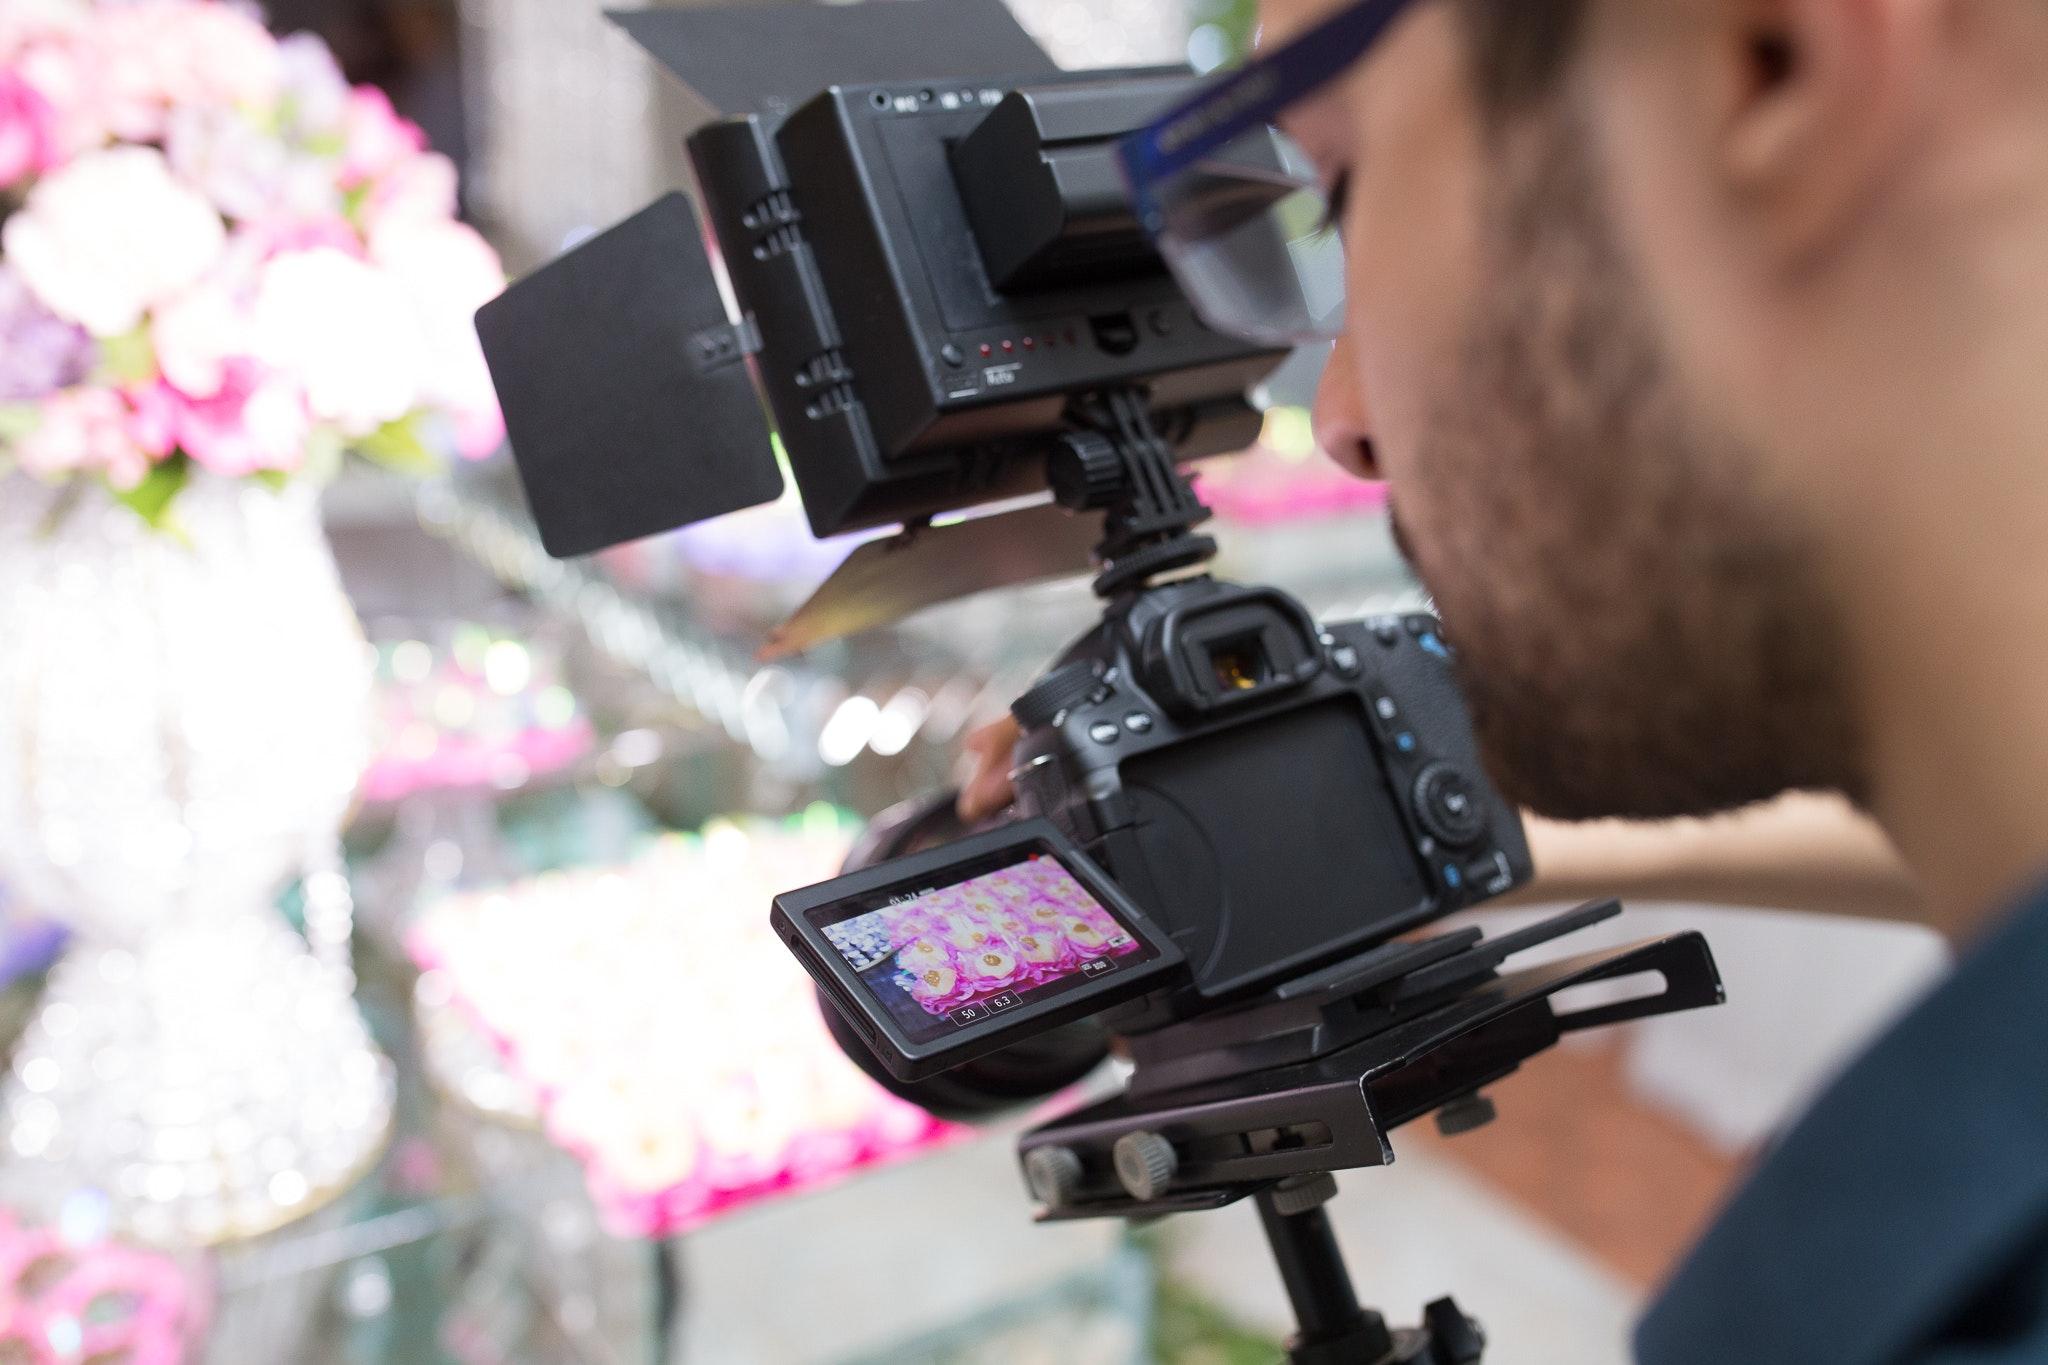 Destination Wedding Video Guidelines From Wedaways